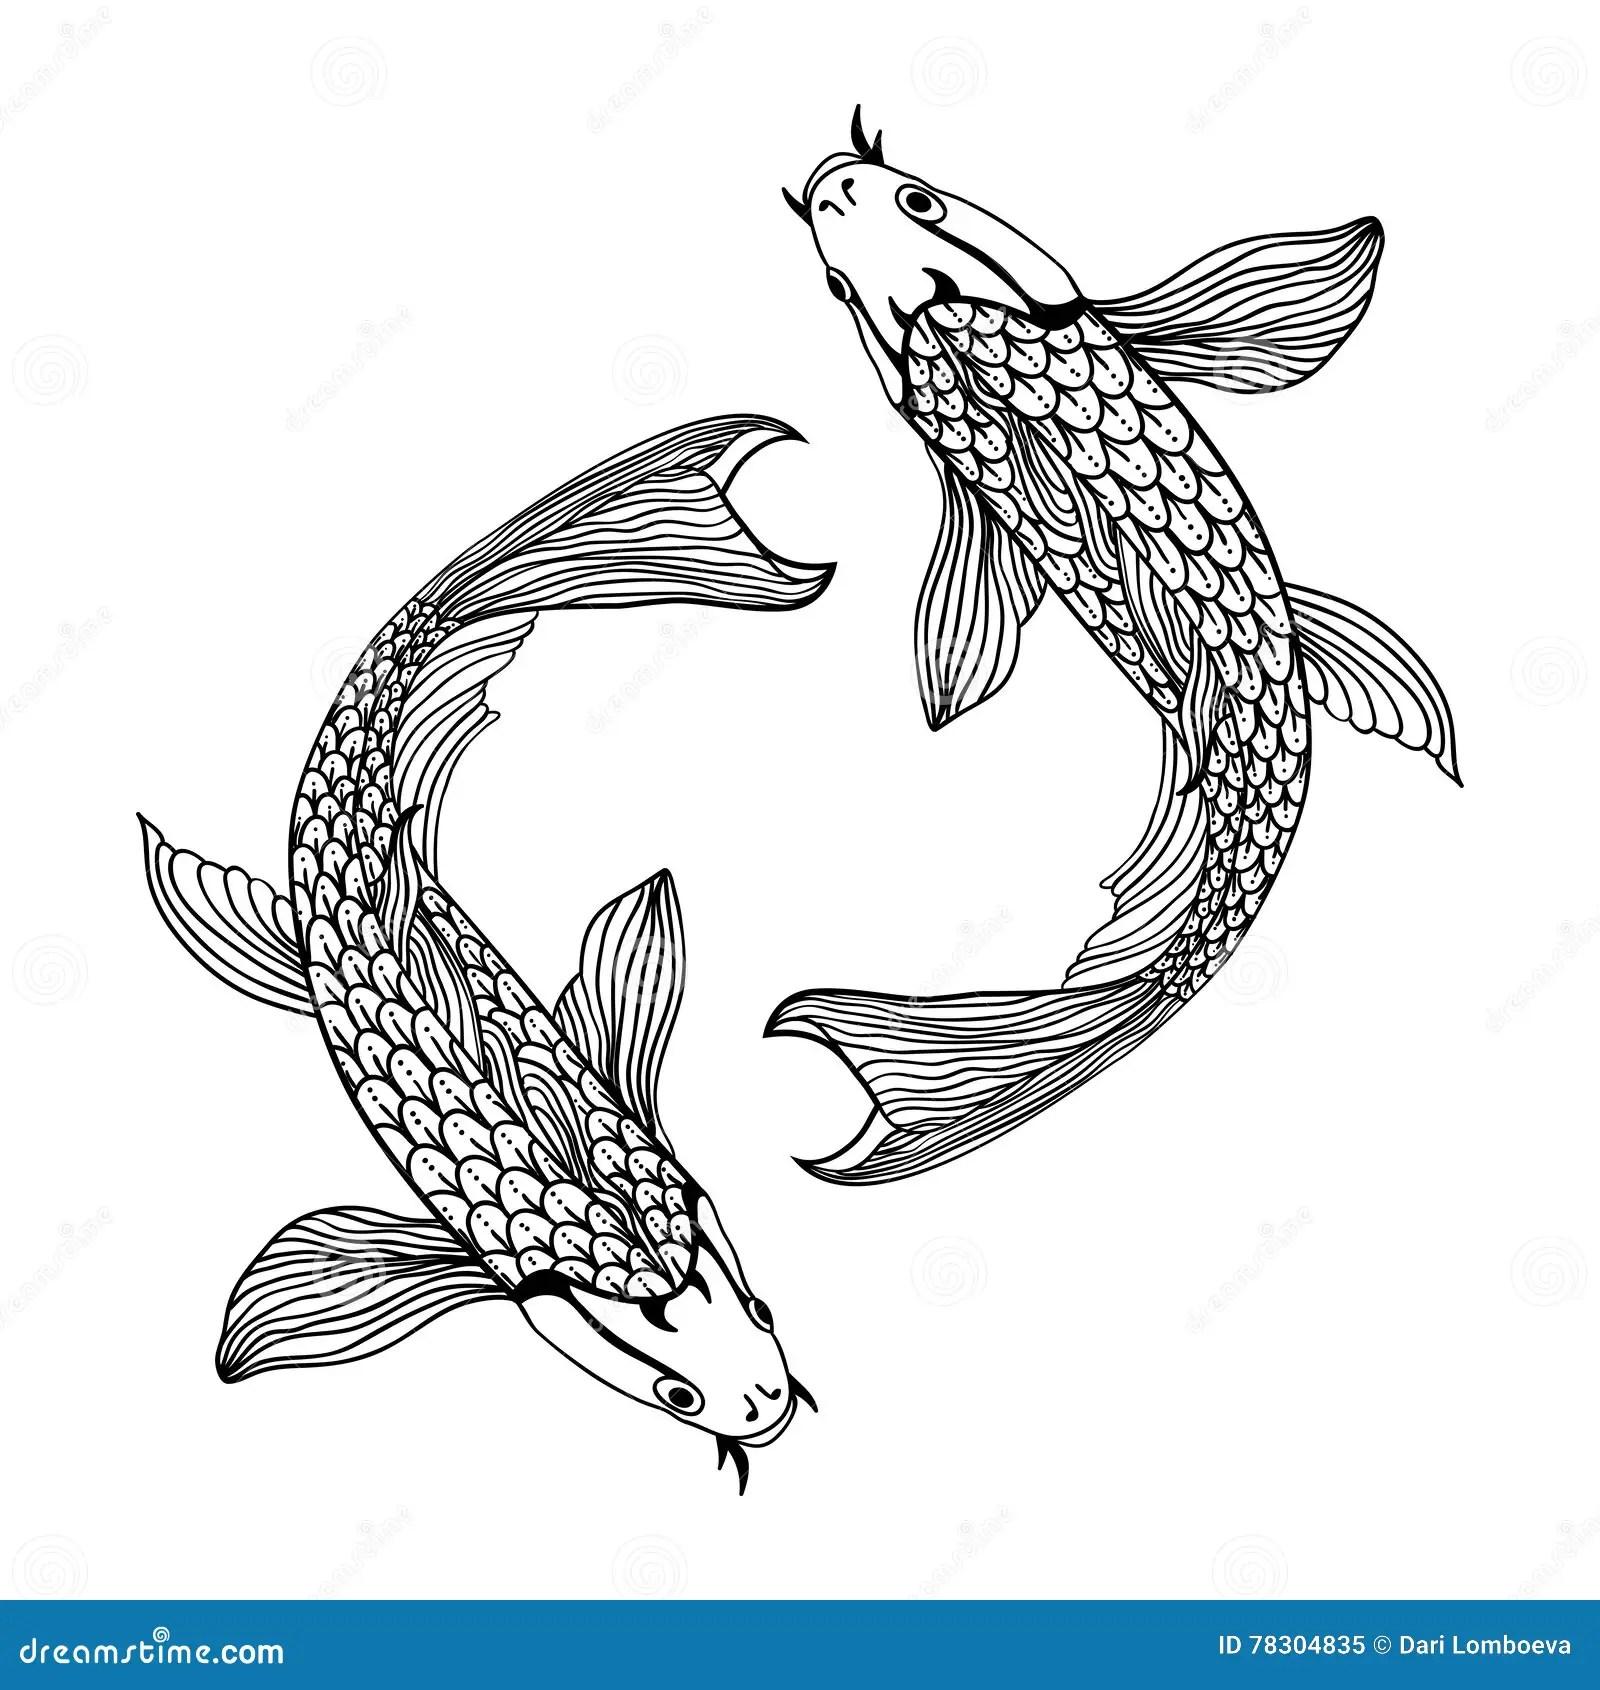 Beautiful Koi Carp Fish Illustration In Monochrome Symbol